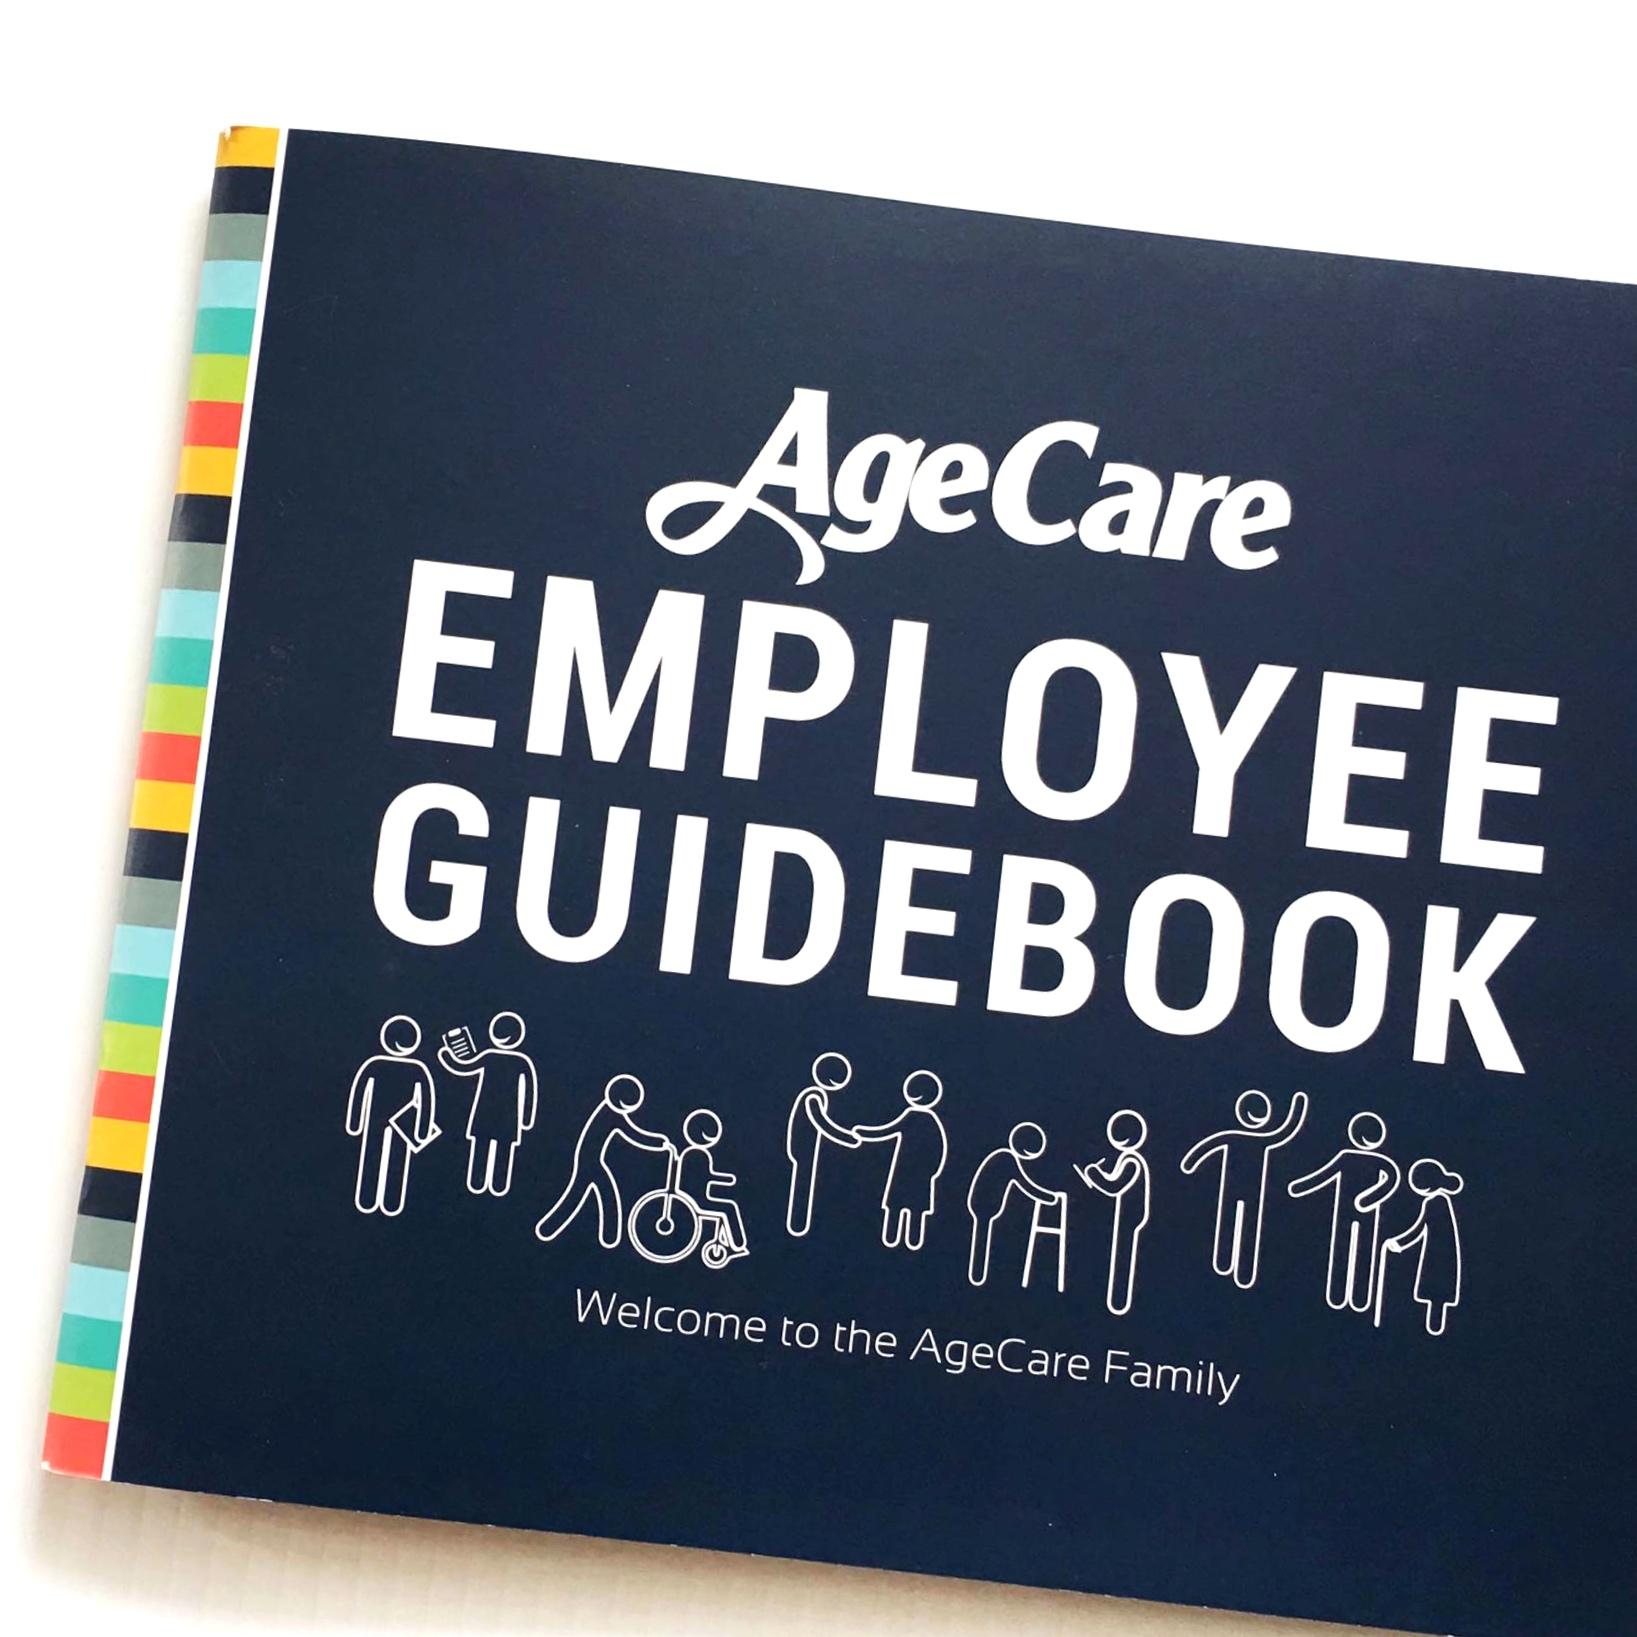 AgeCare Employee Guide